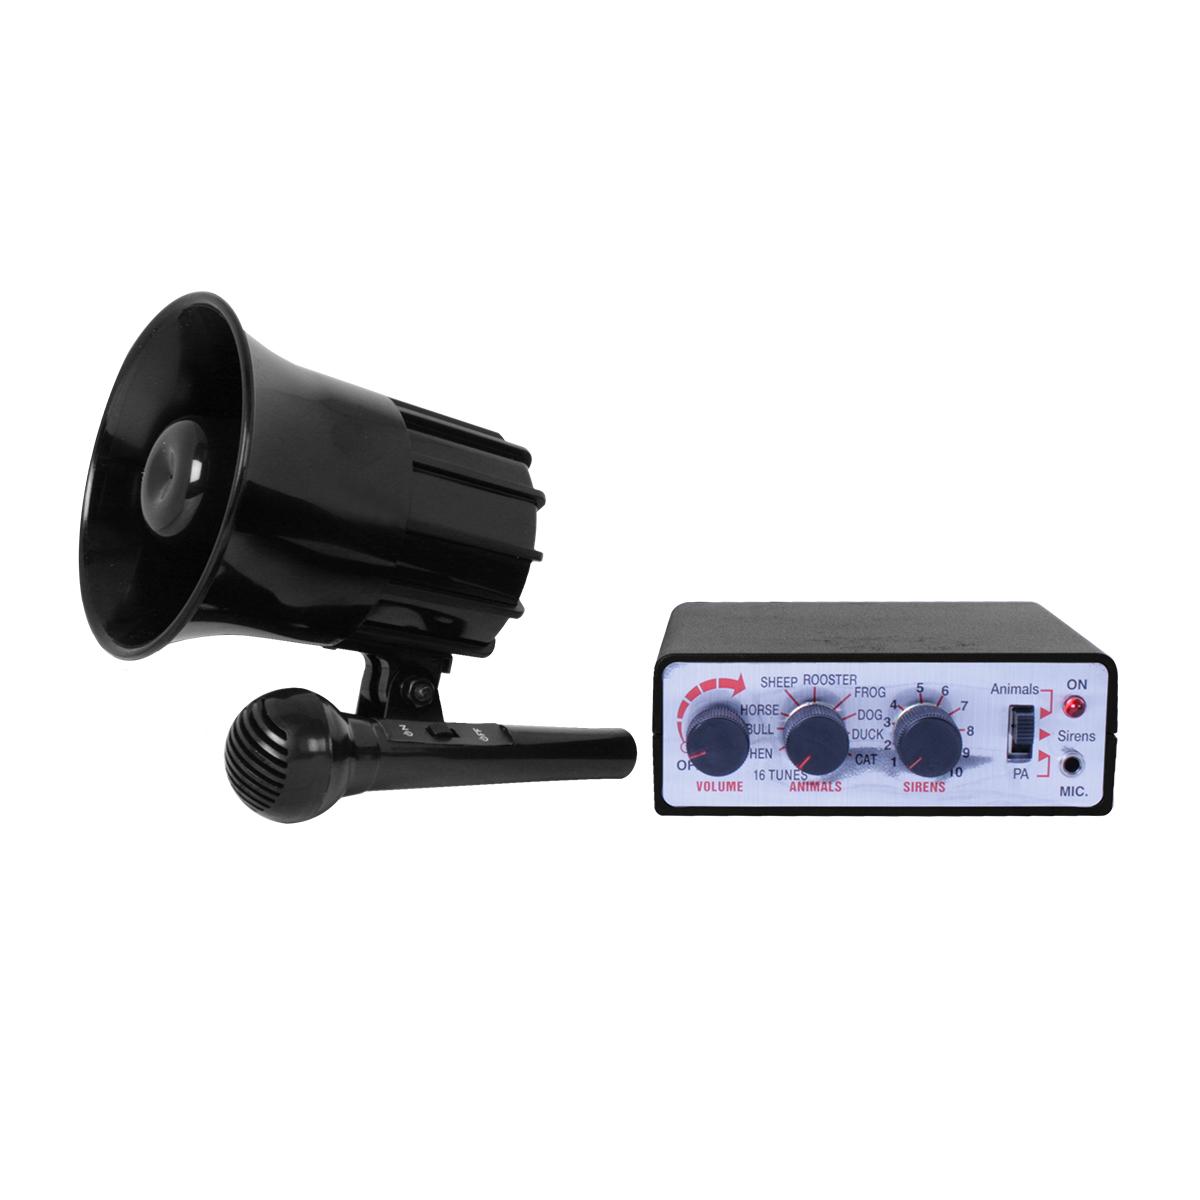 5 Sirens /& 5 Animal Sounds 12V SIREN /& PA System